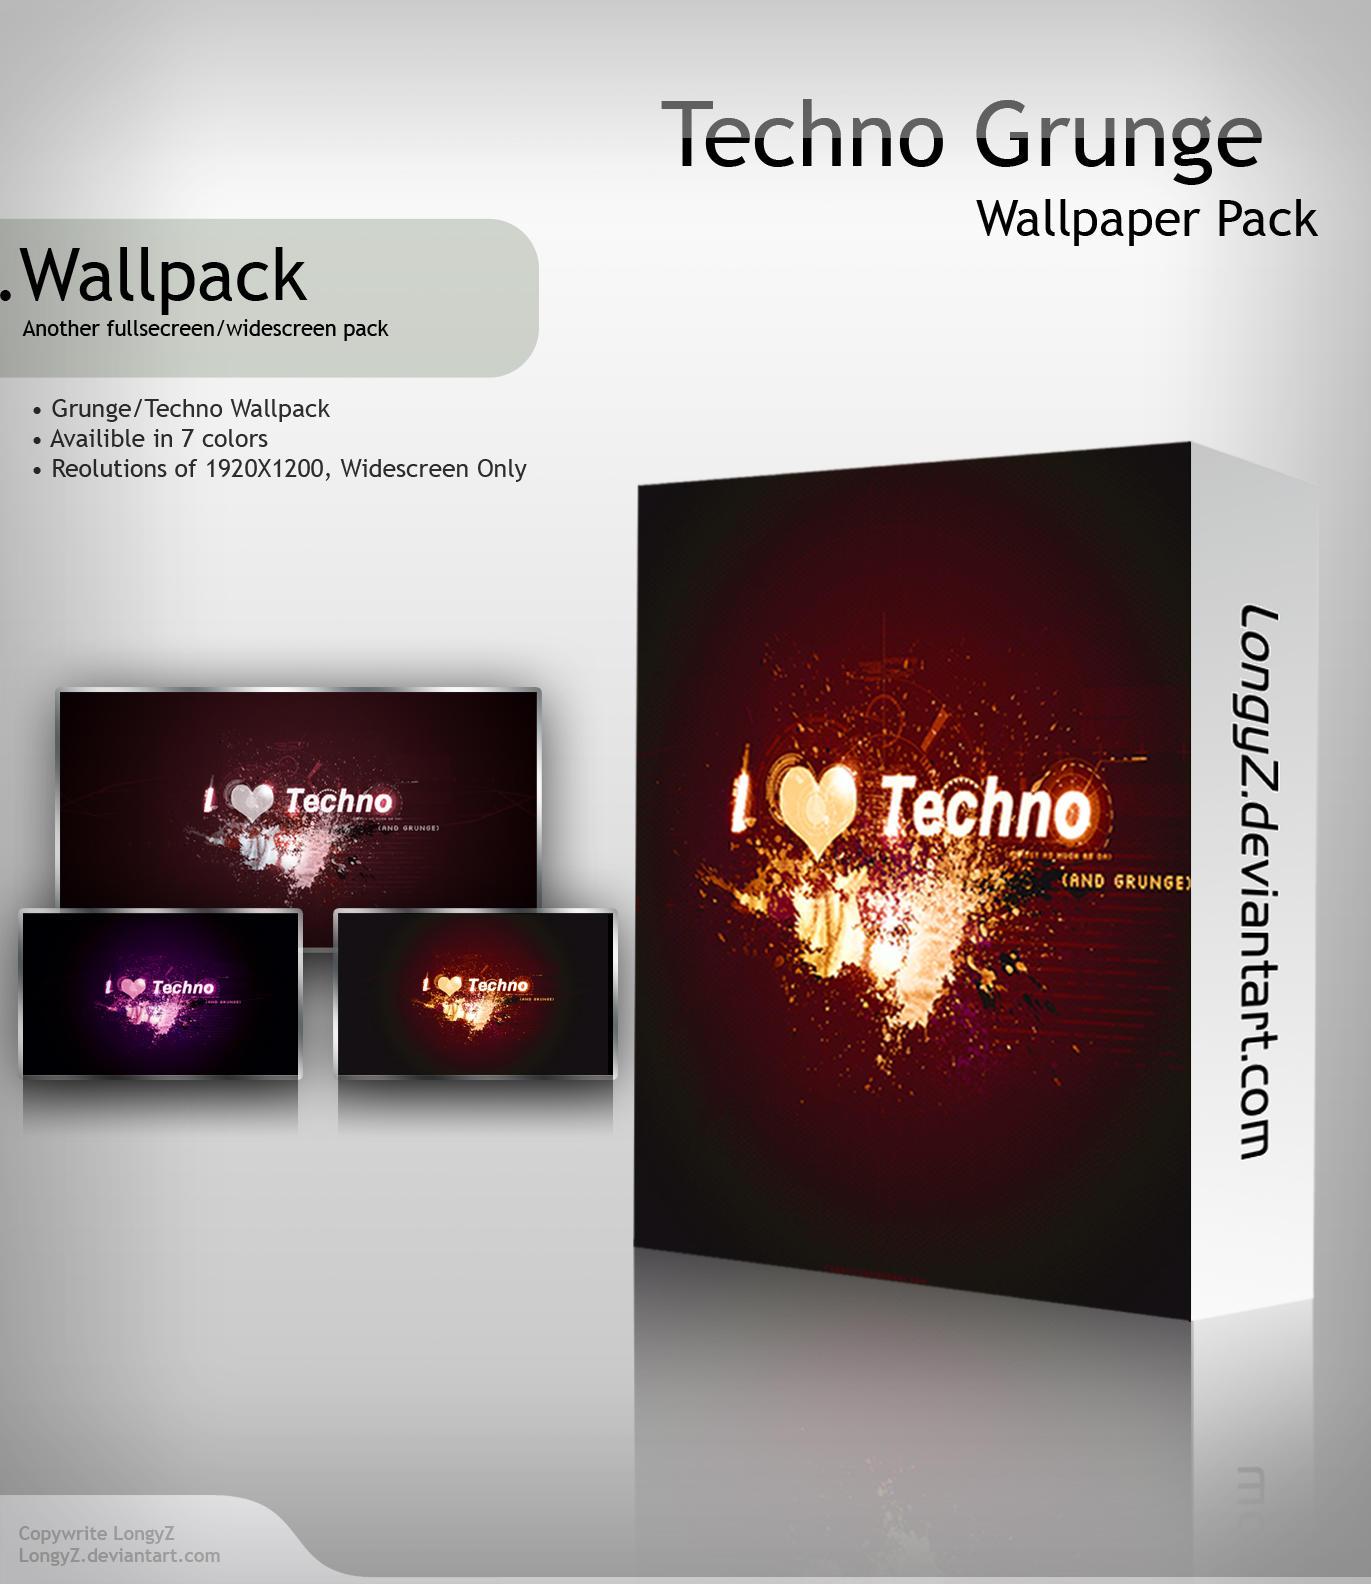 Techno Grunge by LongyZ